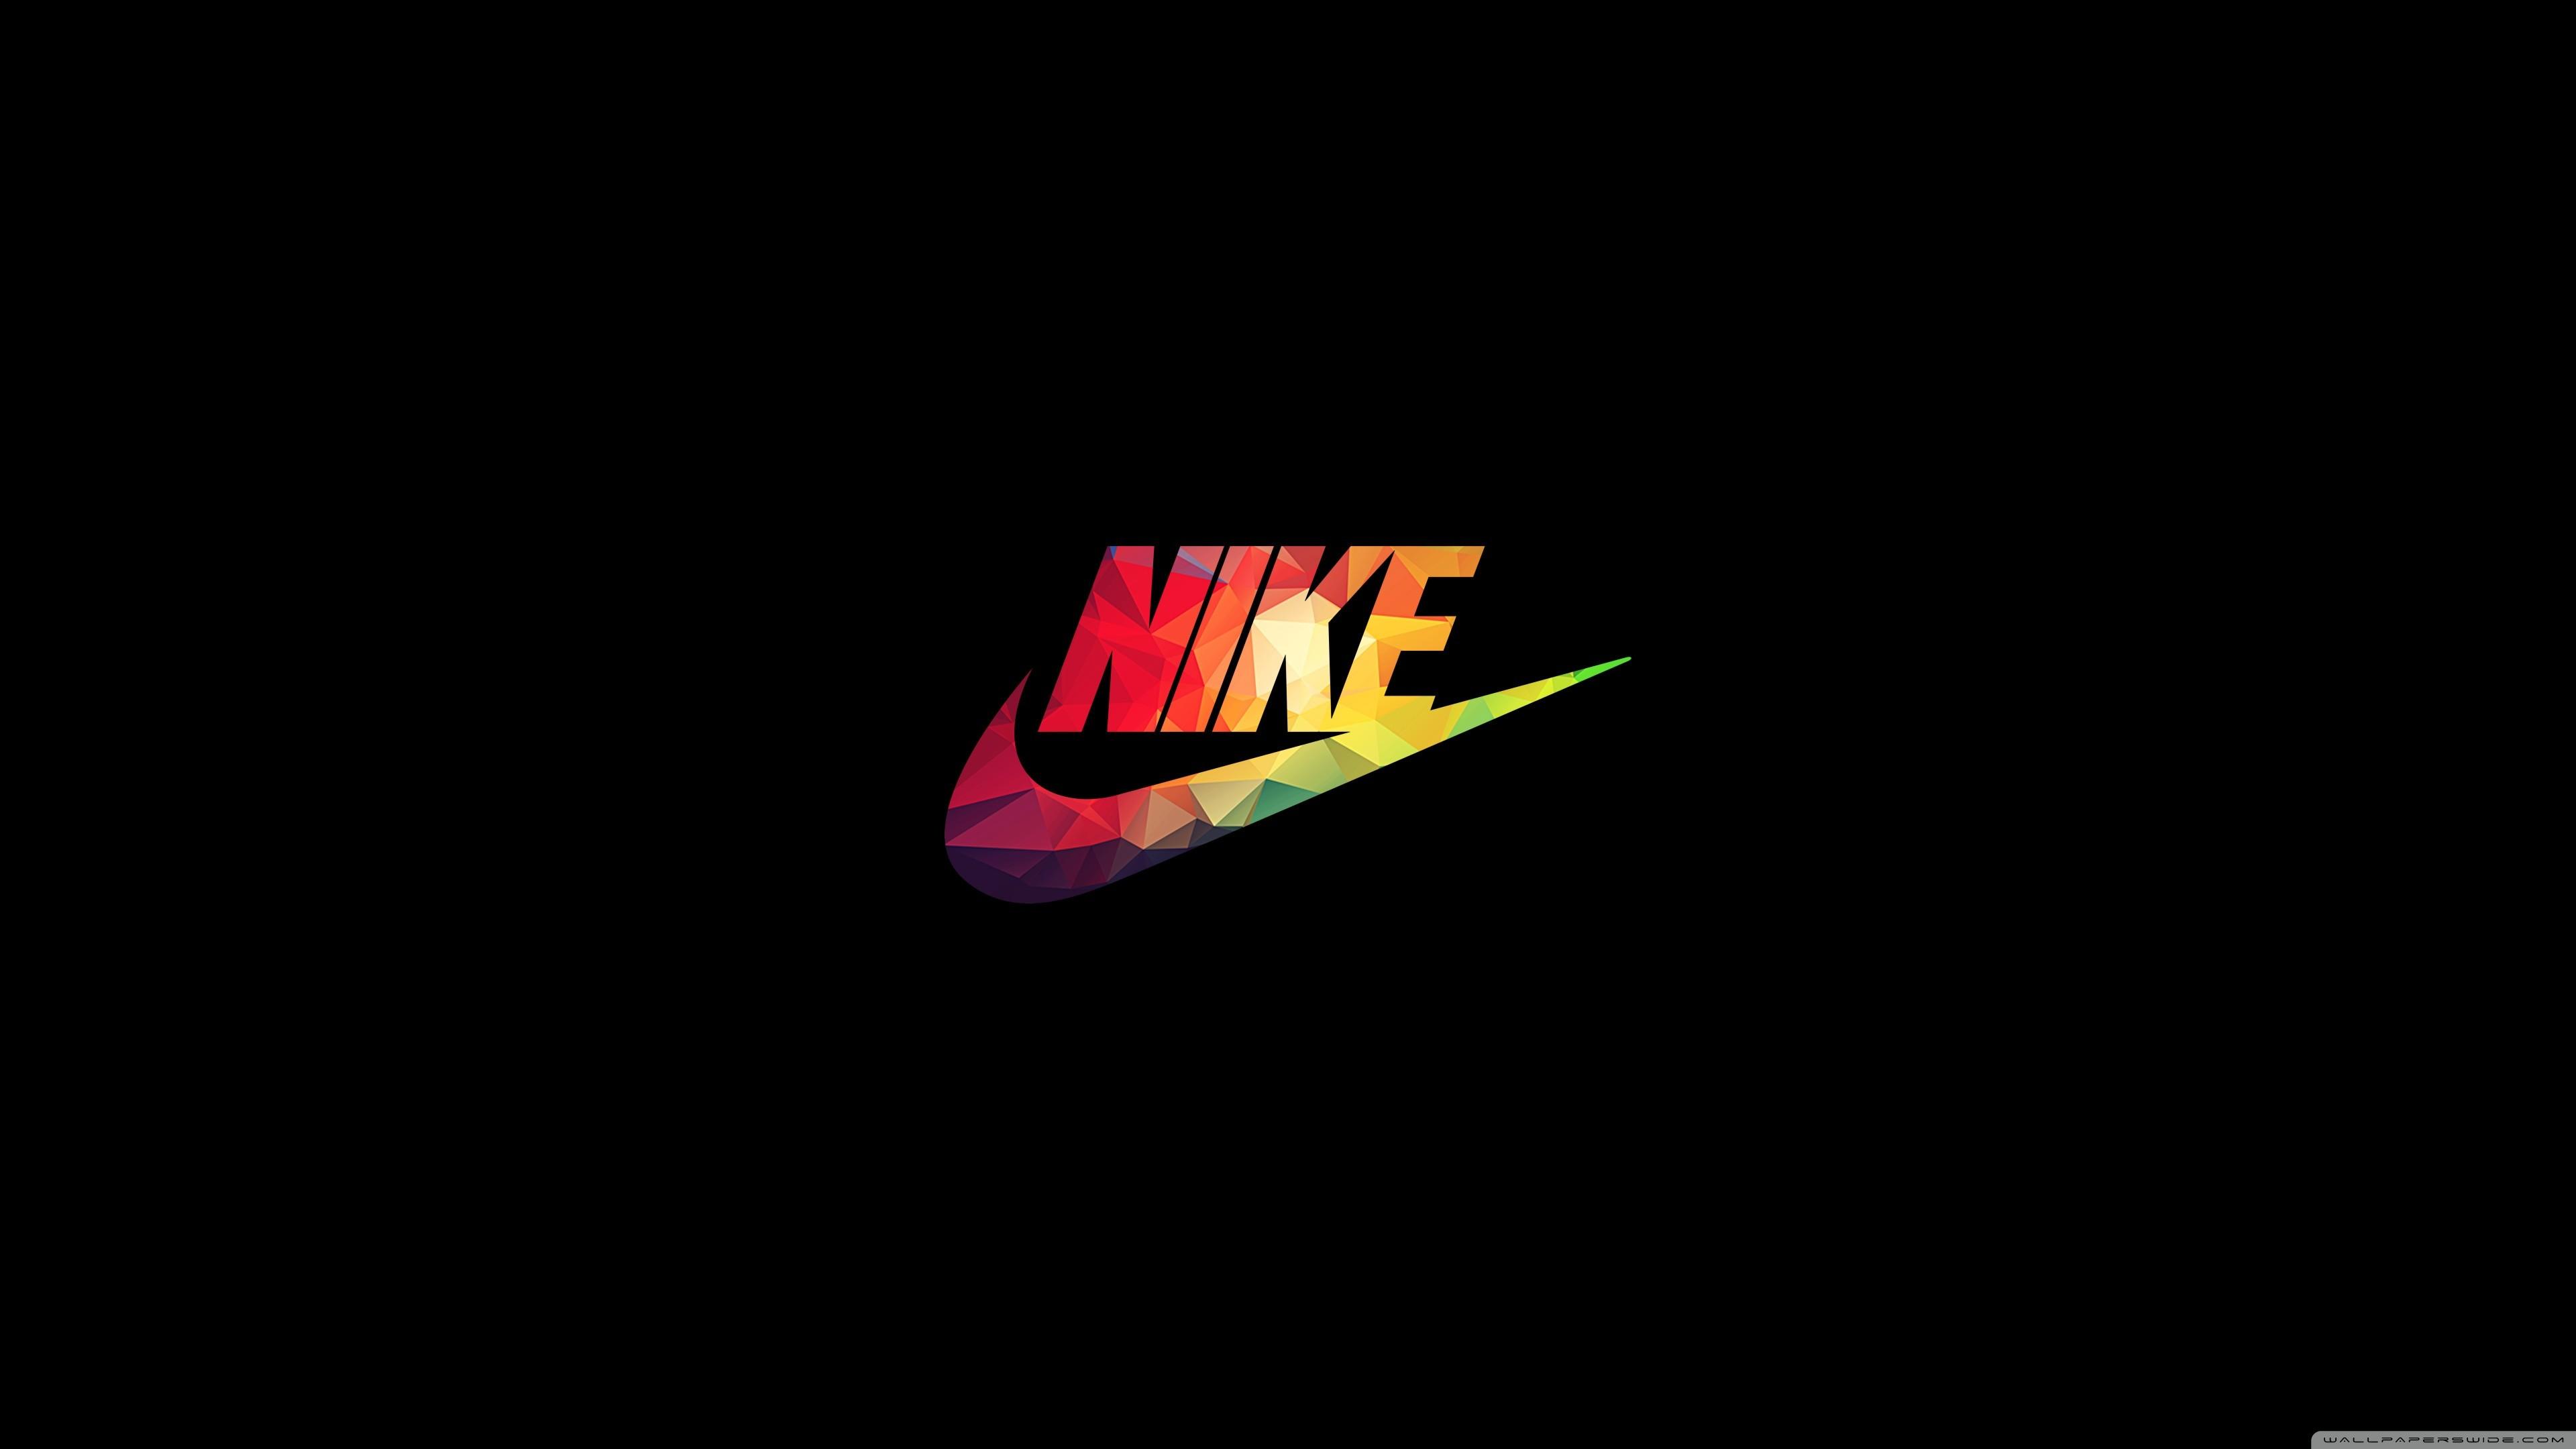 Cool 3d Basketball Wallpapers Nike Girl Wallpaper 61 Images